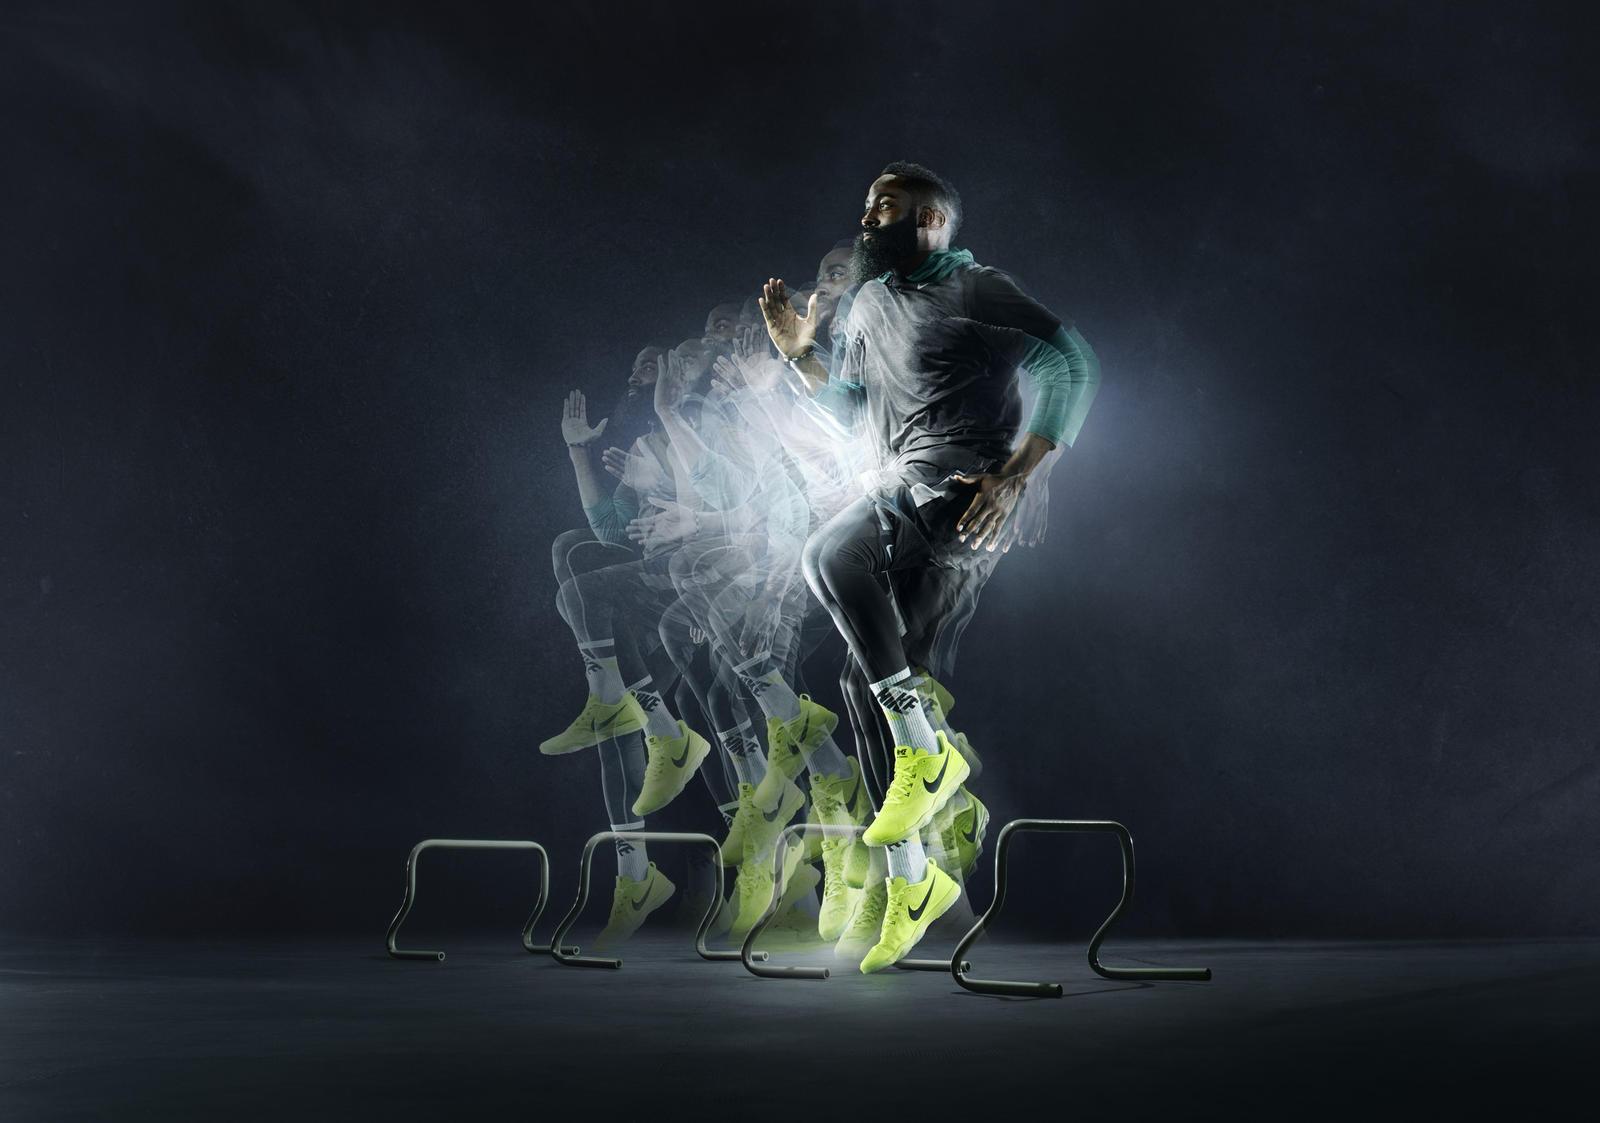 Gym Girl Wallpaper 4k Leading From The Front The Nike Zoom Hypercross Trainer